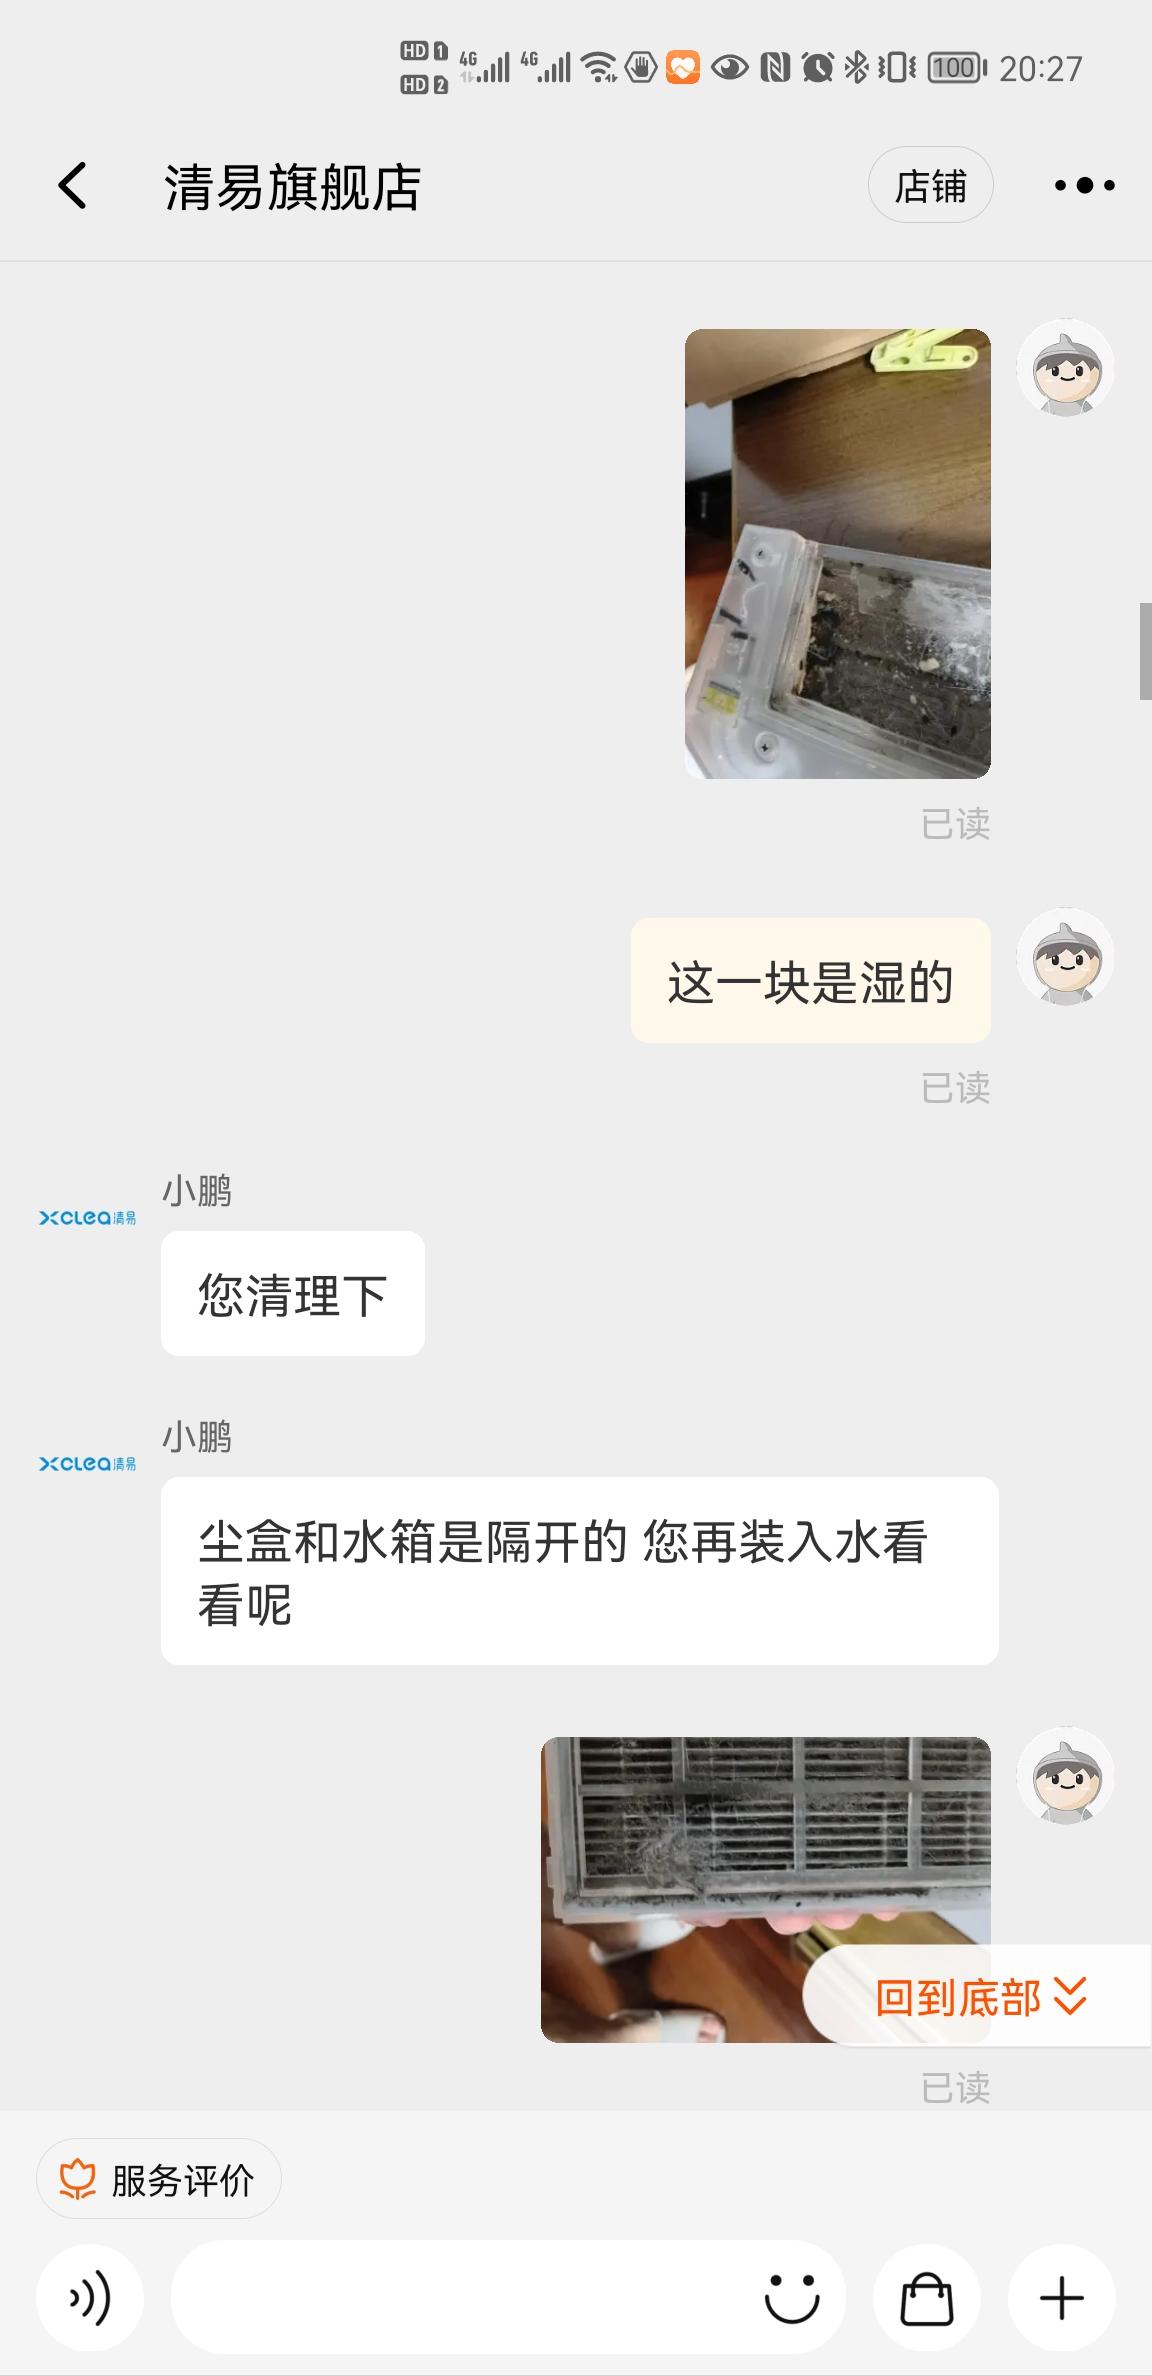 Screenshot_20210903_202722_com.taobao.taobao.jpg